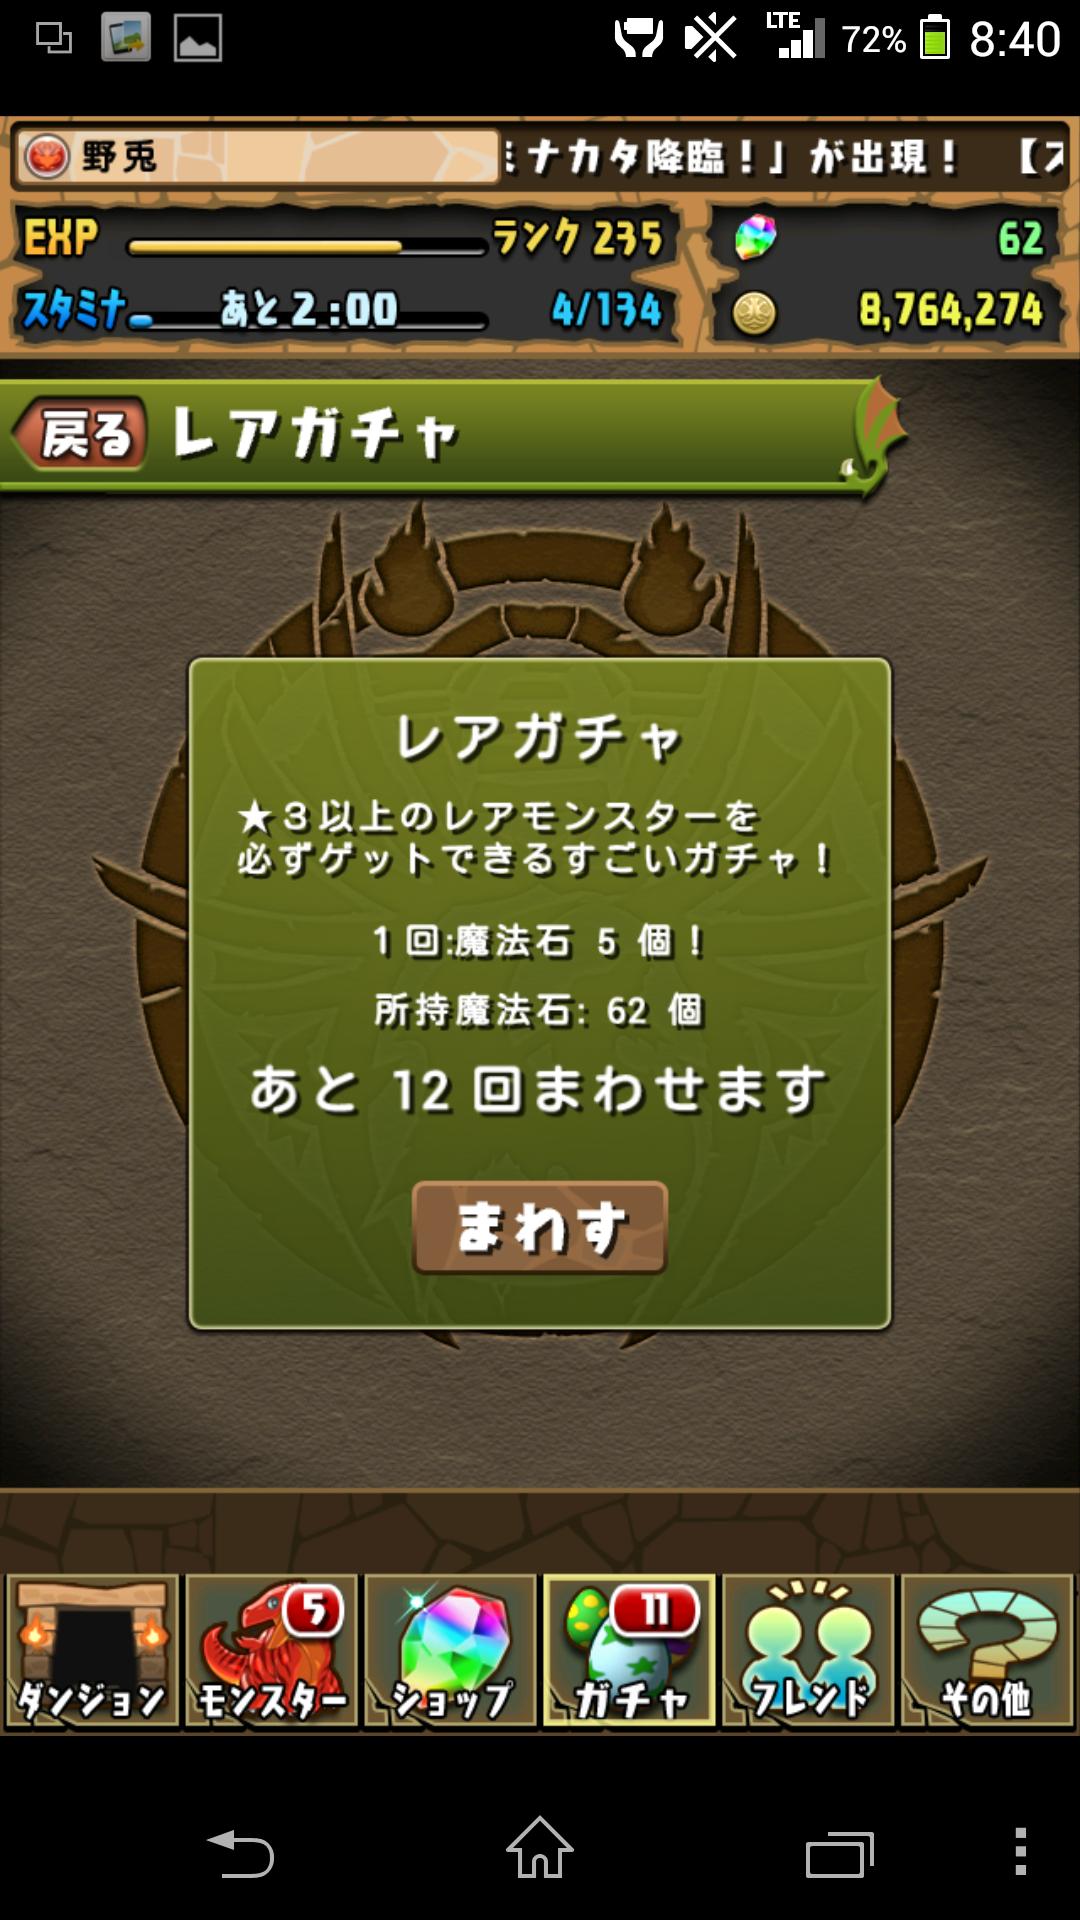 Screenshot_2014-05-01-08-40-34.png